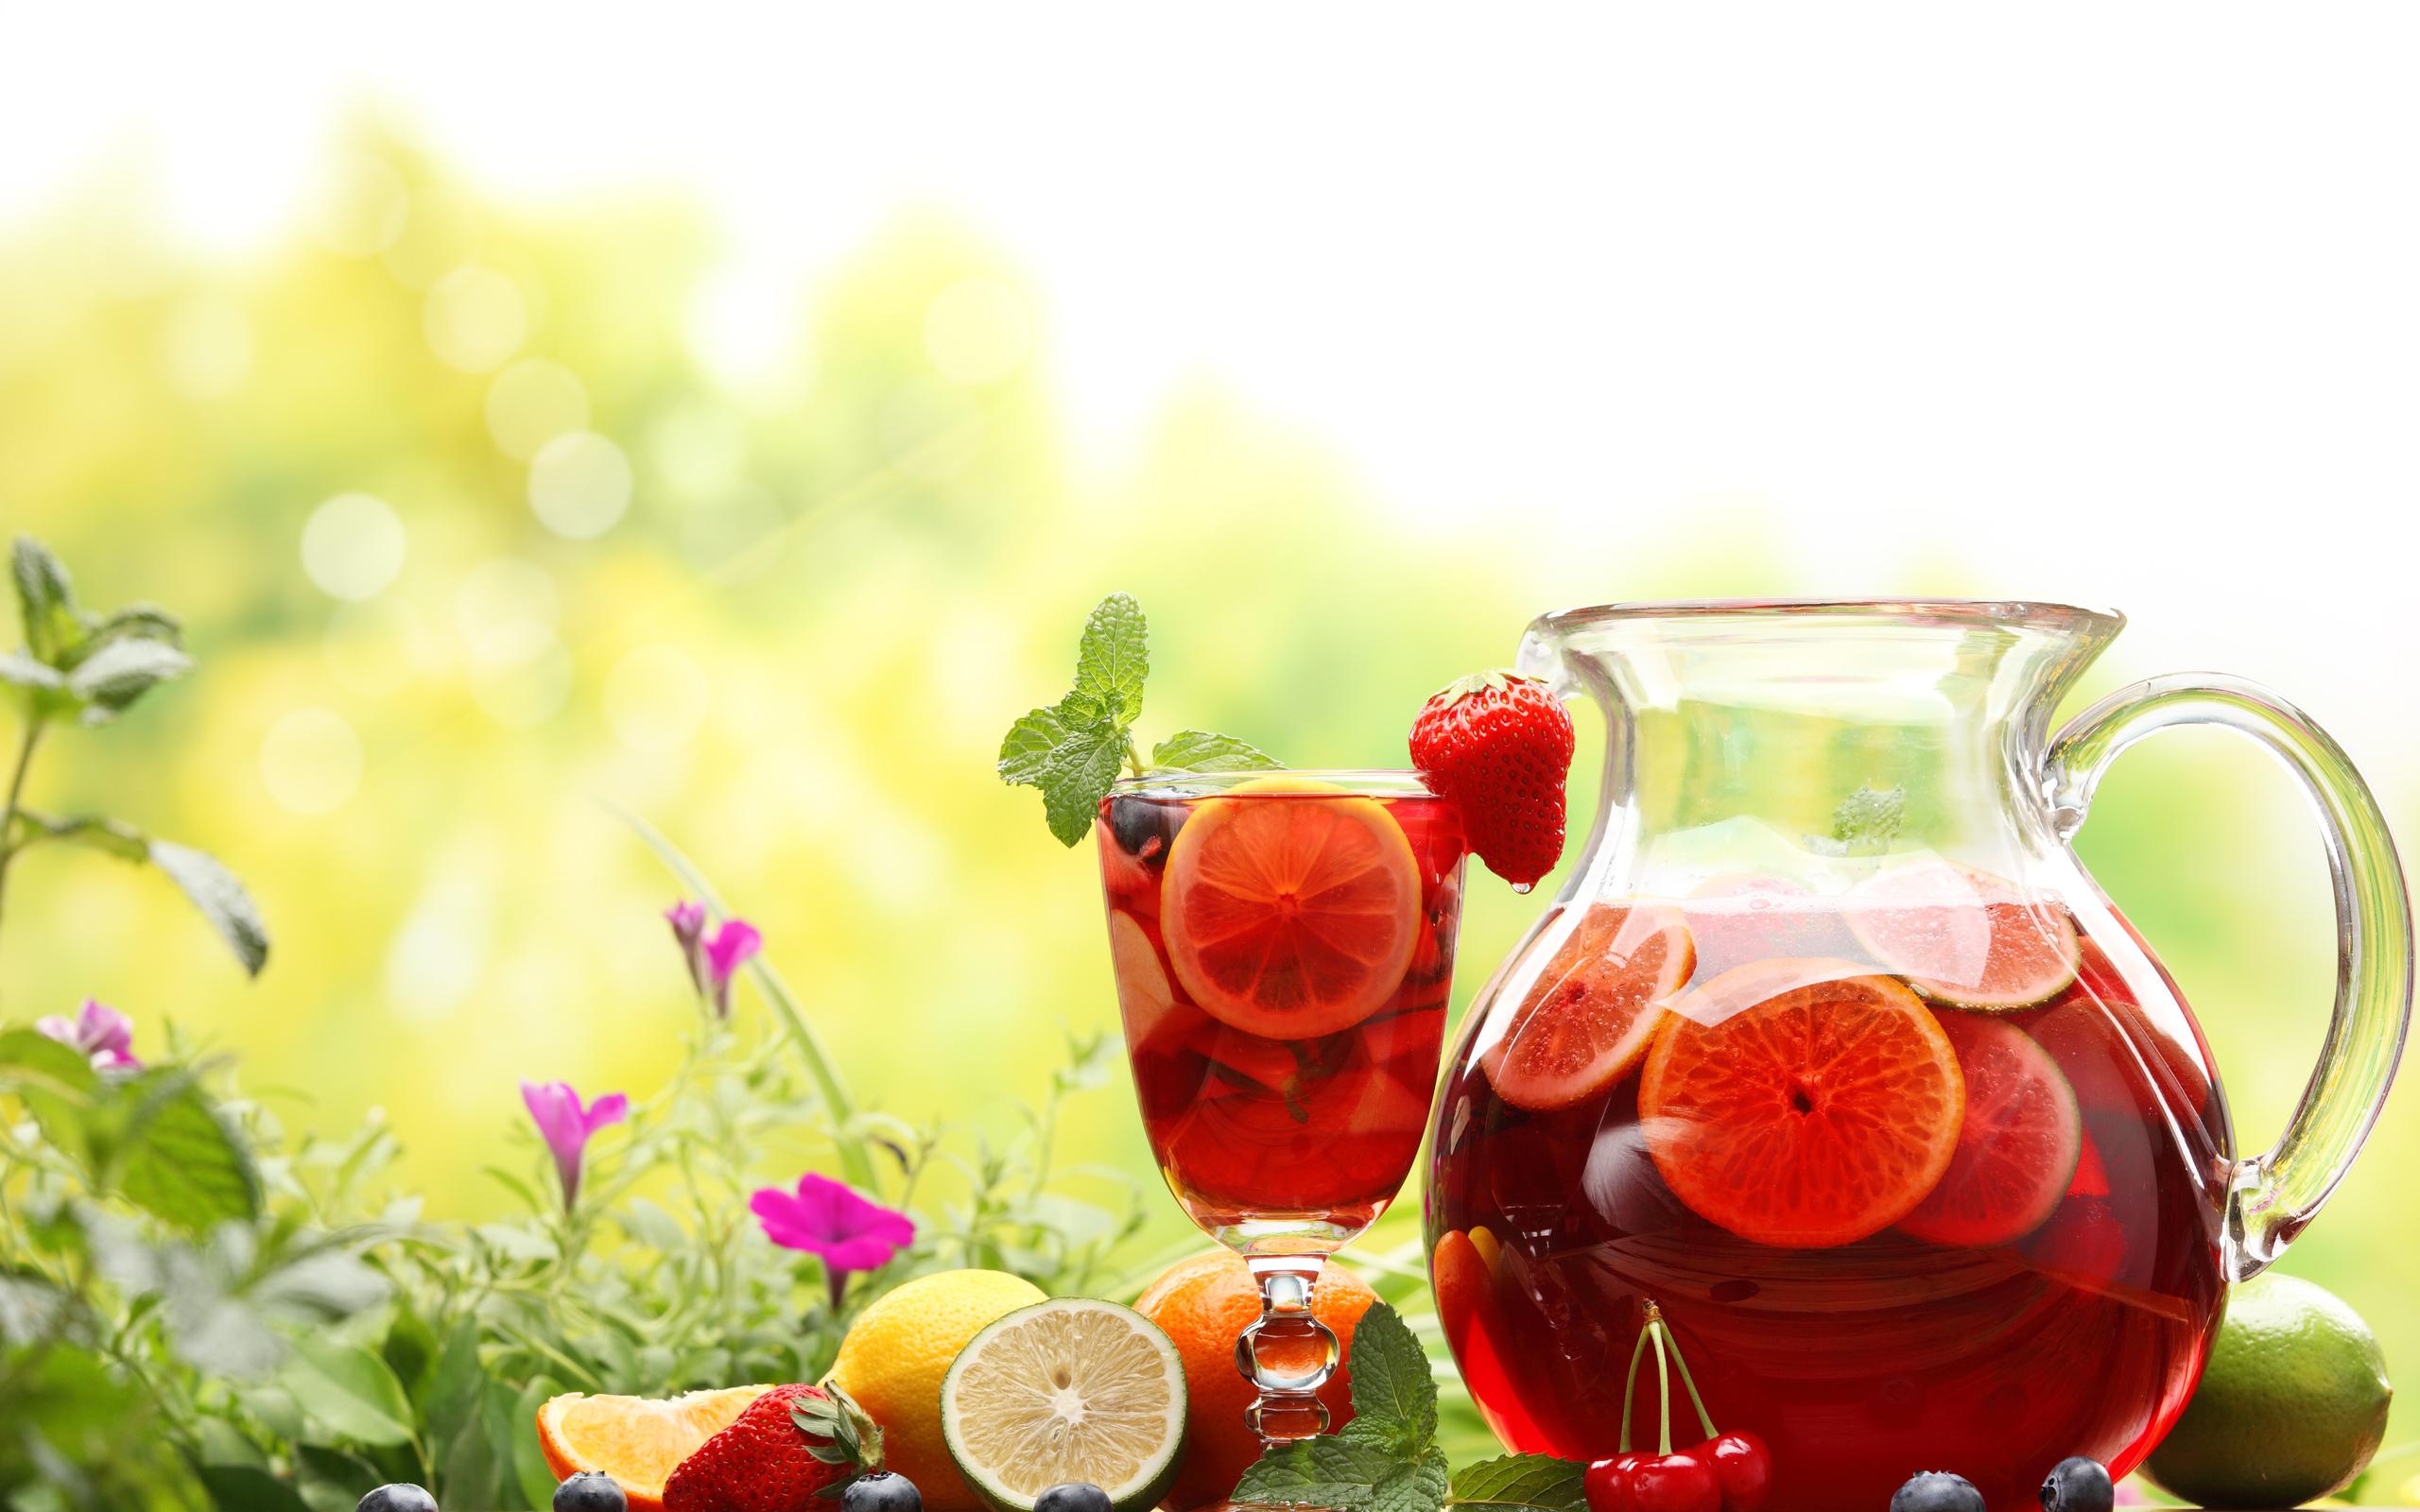 еда напитки лайм лимон апельсин клубника вишня коктейль food drinks lime lemon orange strawberry cherry cocktail  № 2154651  скачать